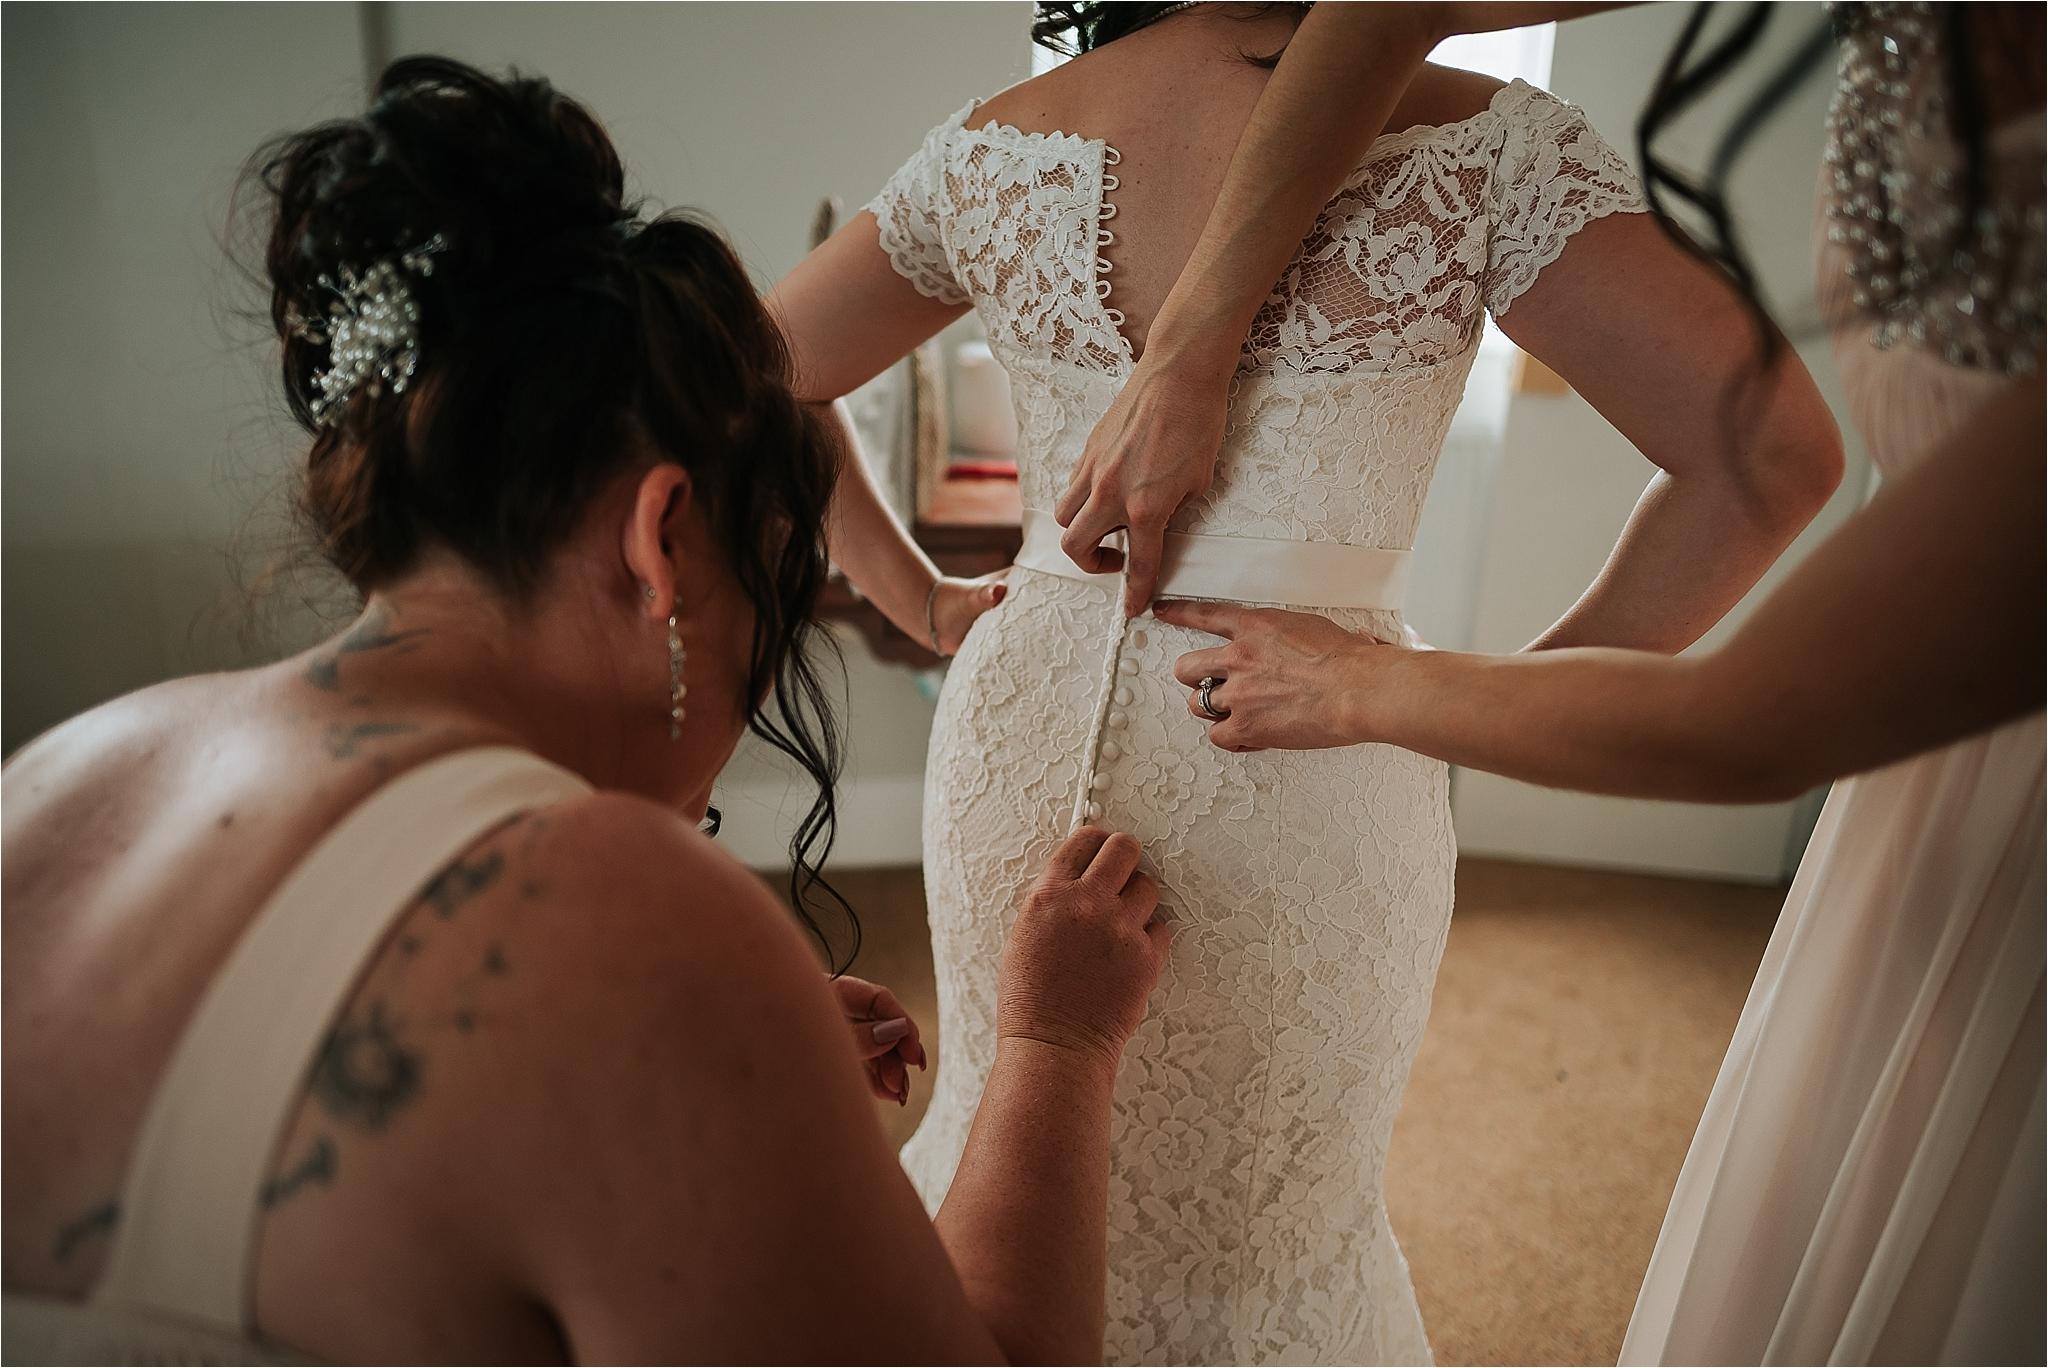 thevilla+lancashire+wreagreen+wedding+photographer89.jpg